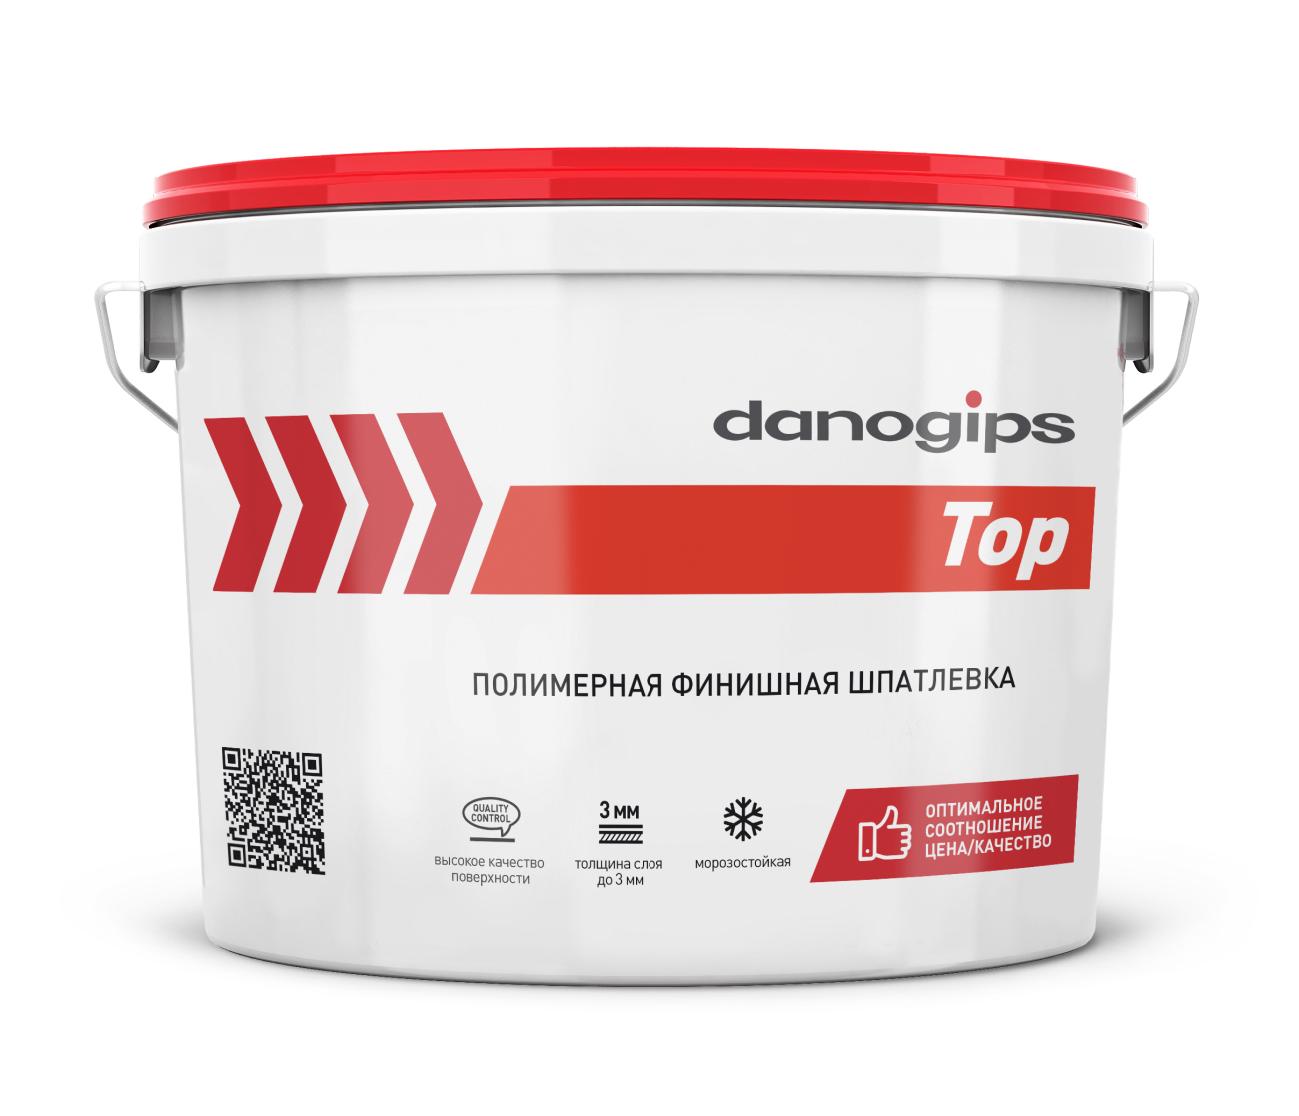 Danogips DANO TOP 5 Шпатлевка готовая финишная